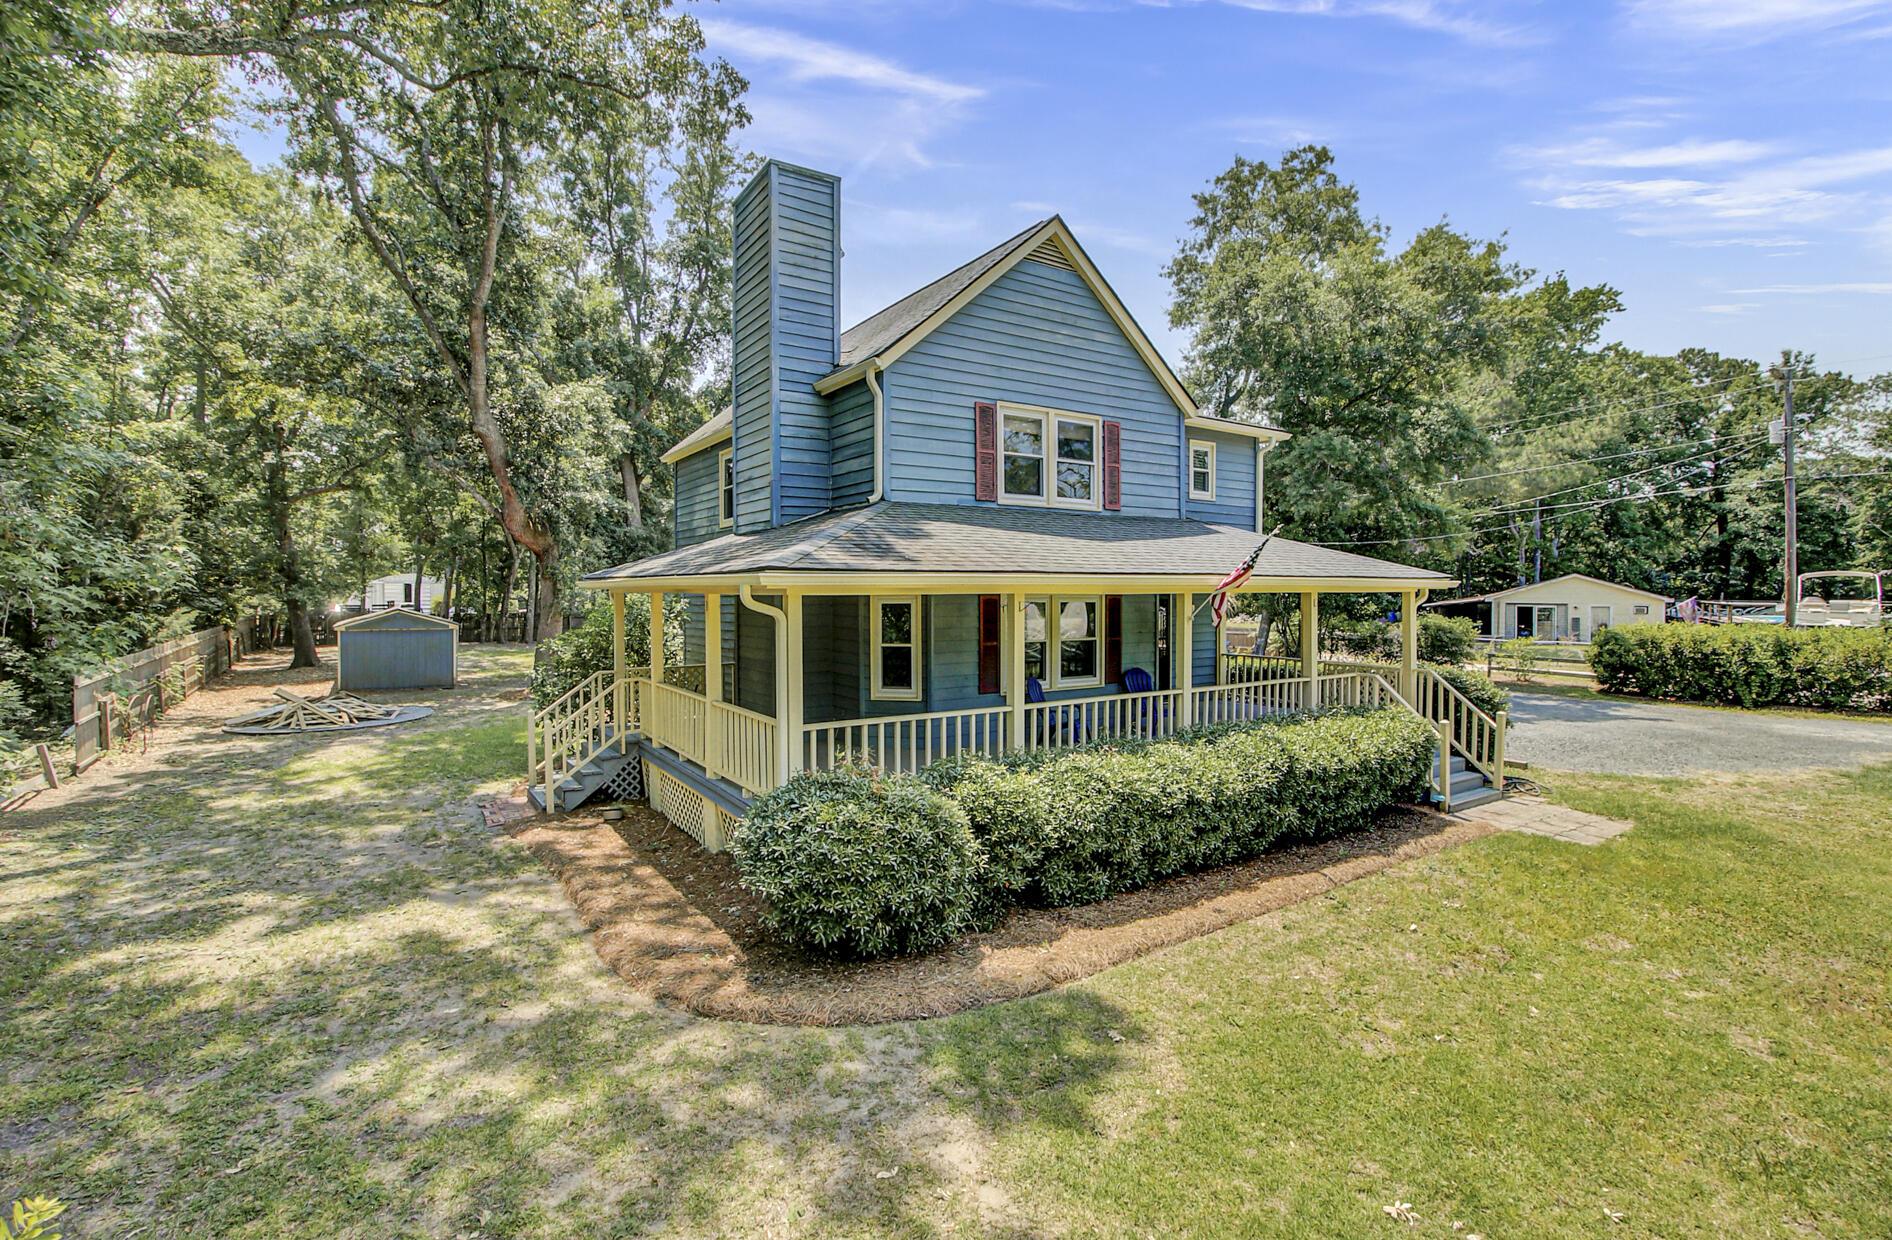 Yaugh Hall Homes For Sale - 1229 Porchers Bluff, Mount Pleasant, SC - 27